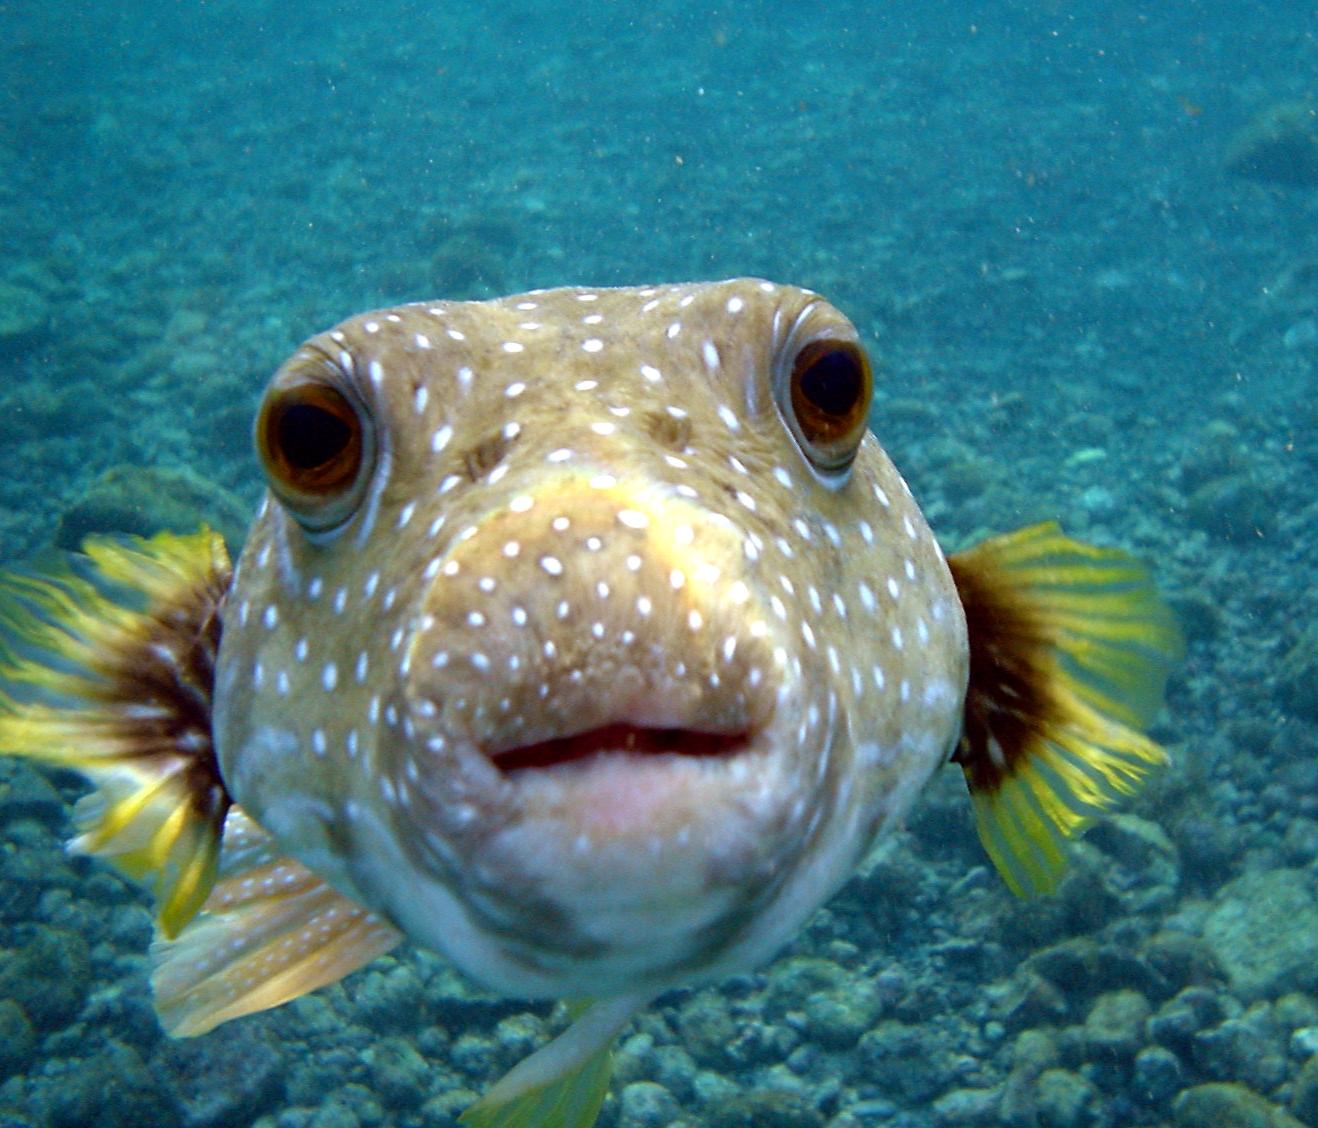 Stonefish a deadly australian marine creature